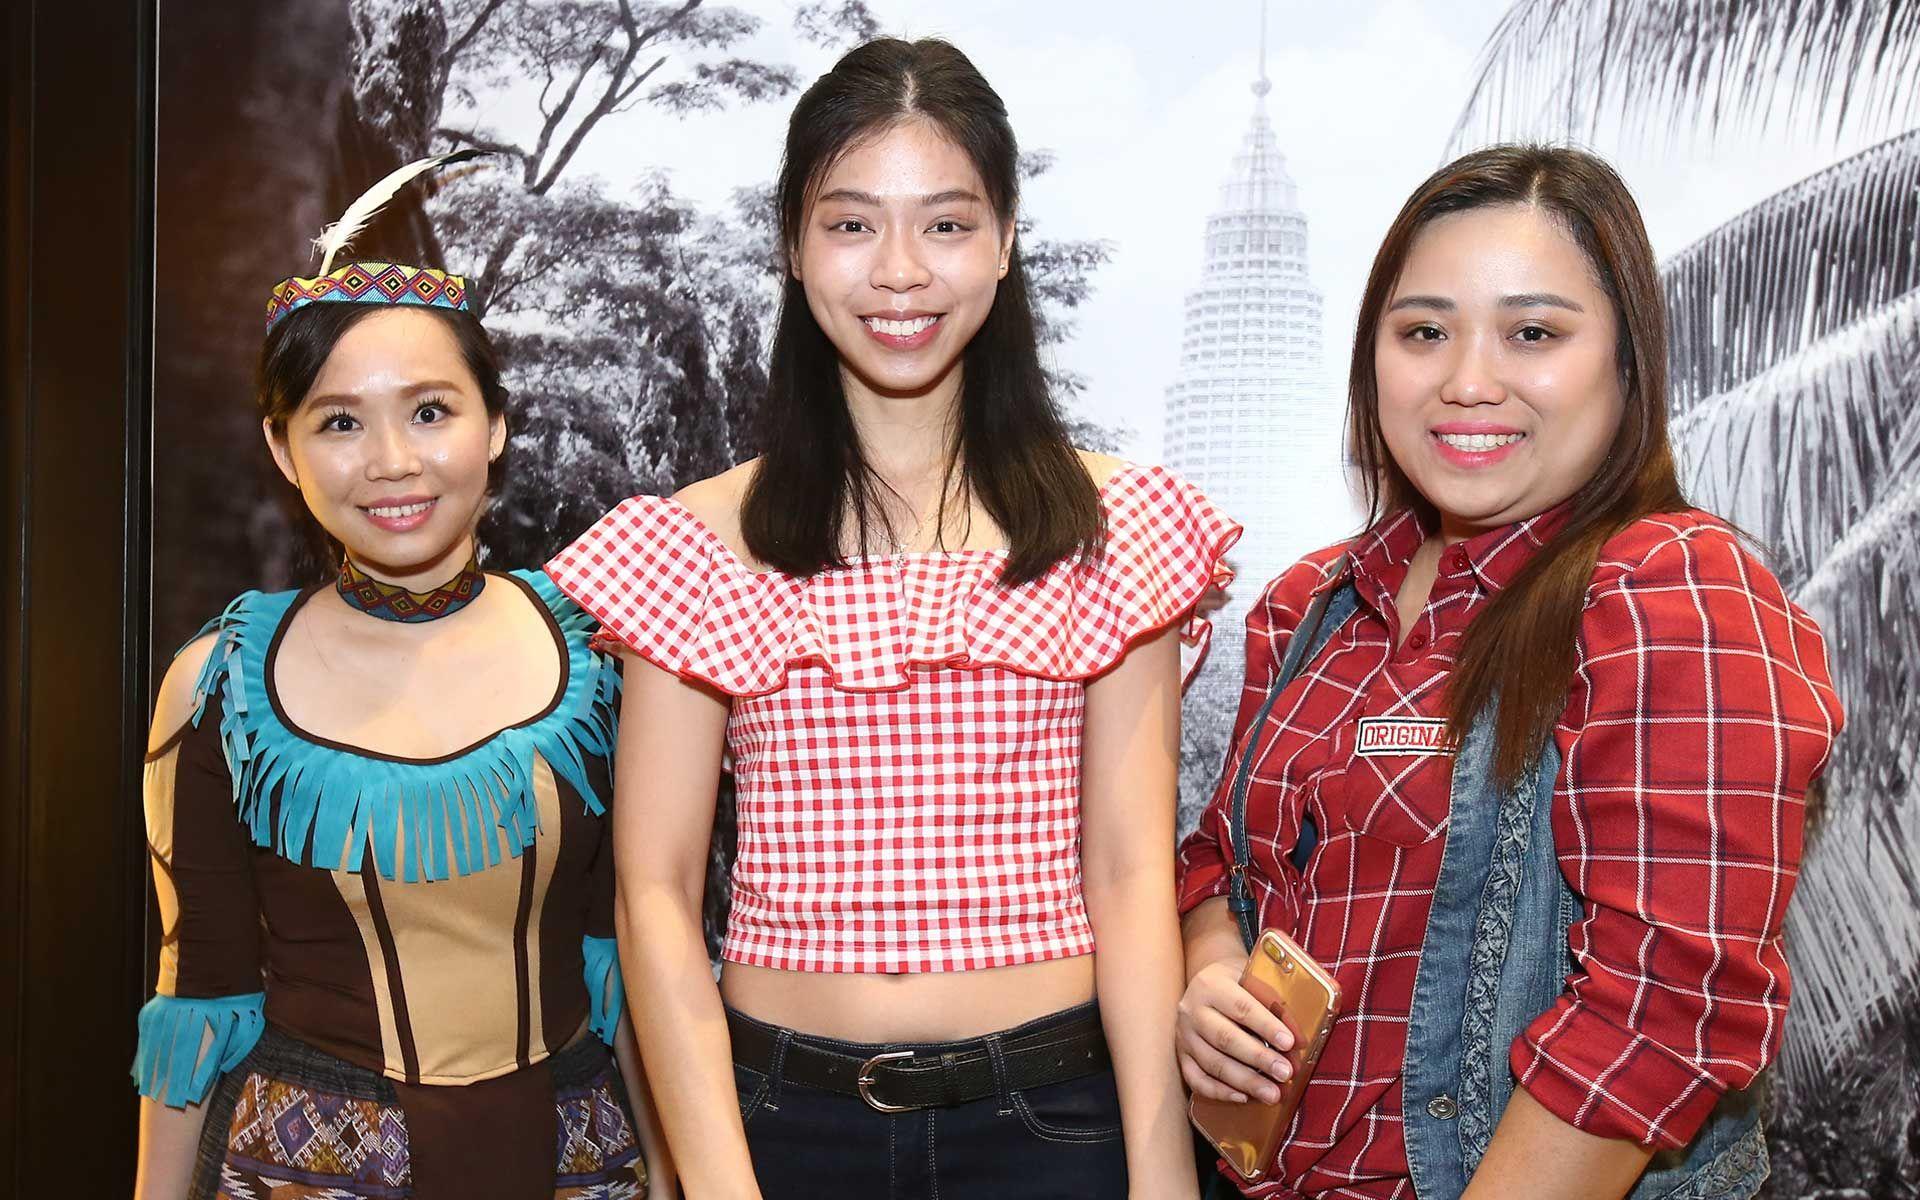 Eunice Chew, Wong Yingjie and Elise Wong